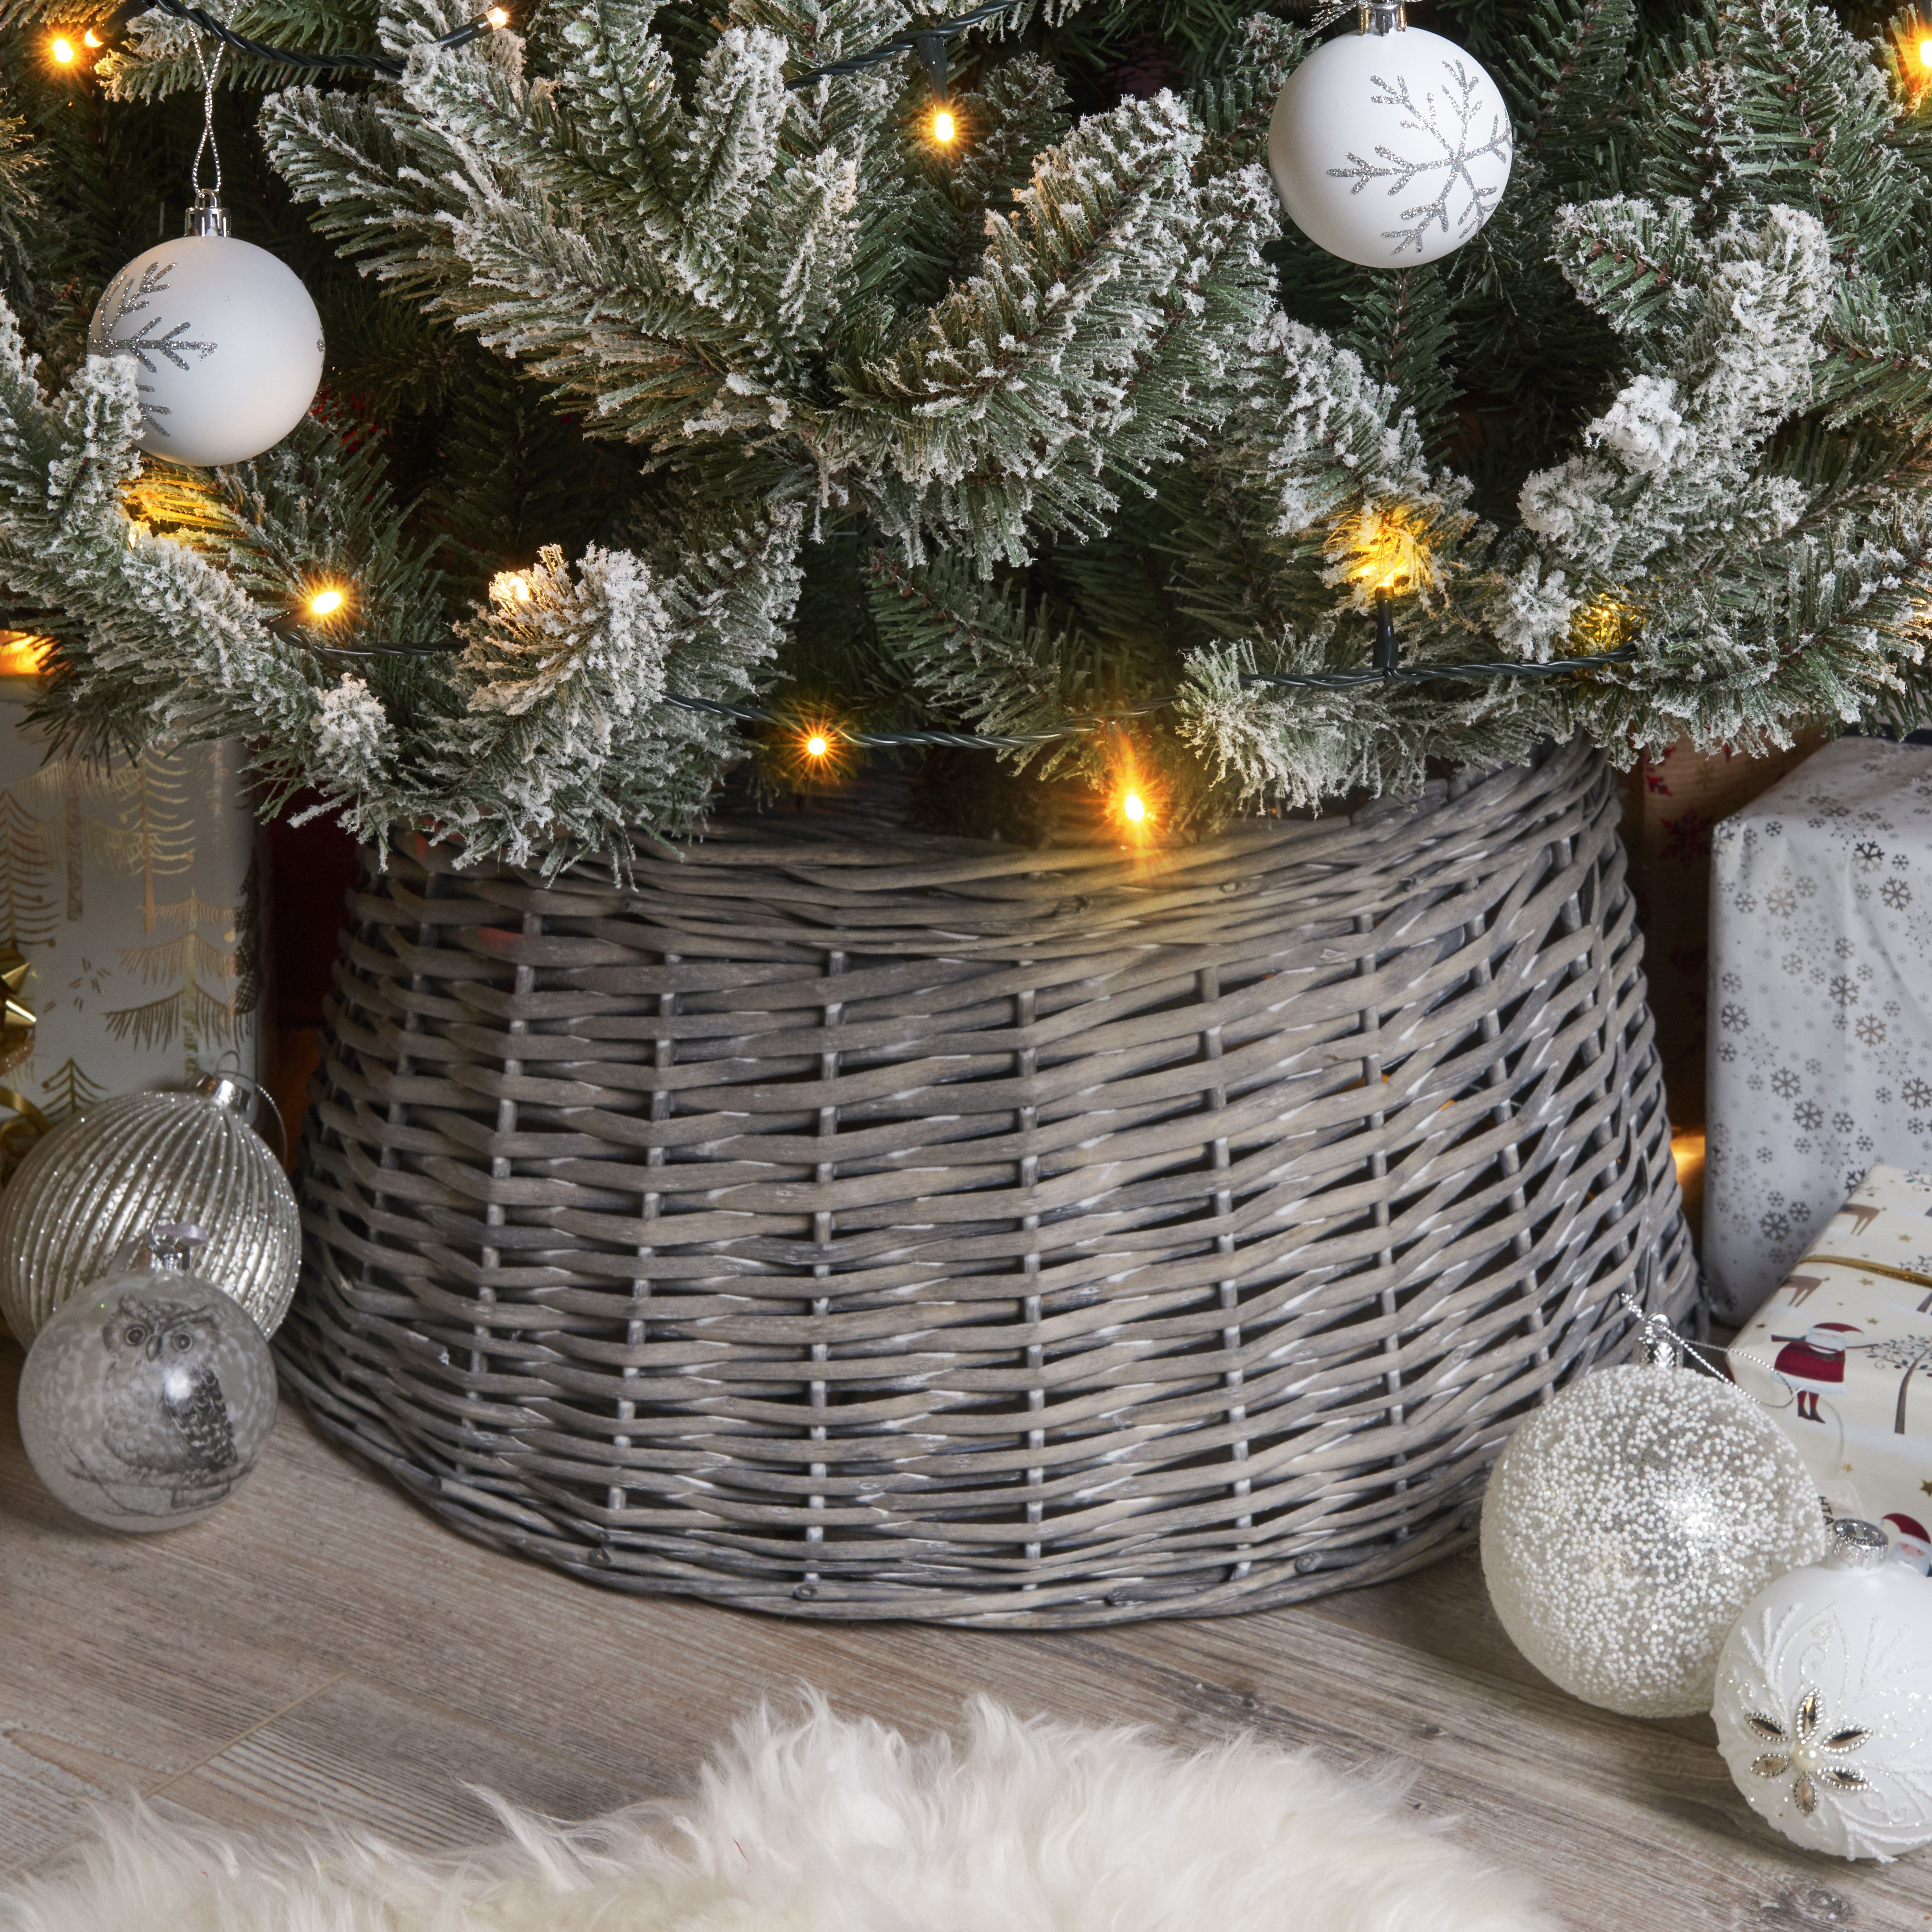 Pin by Gina Balzer on Christmas Wicker tree skirt